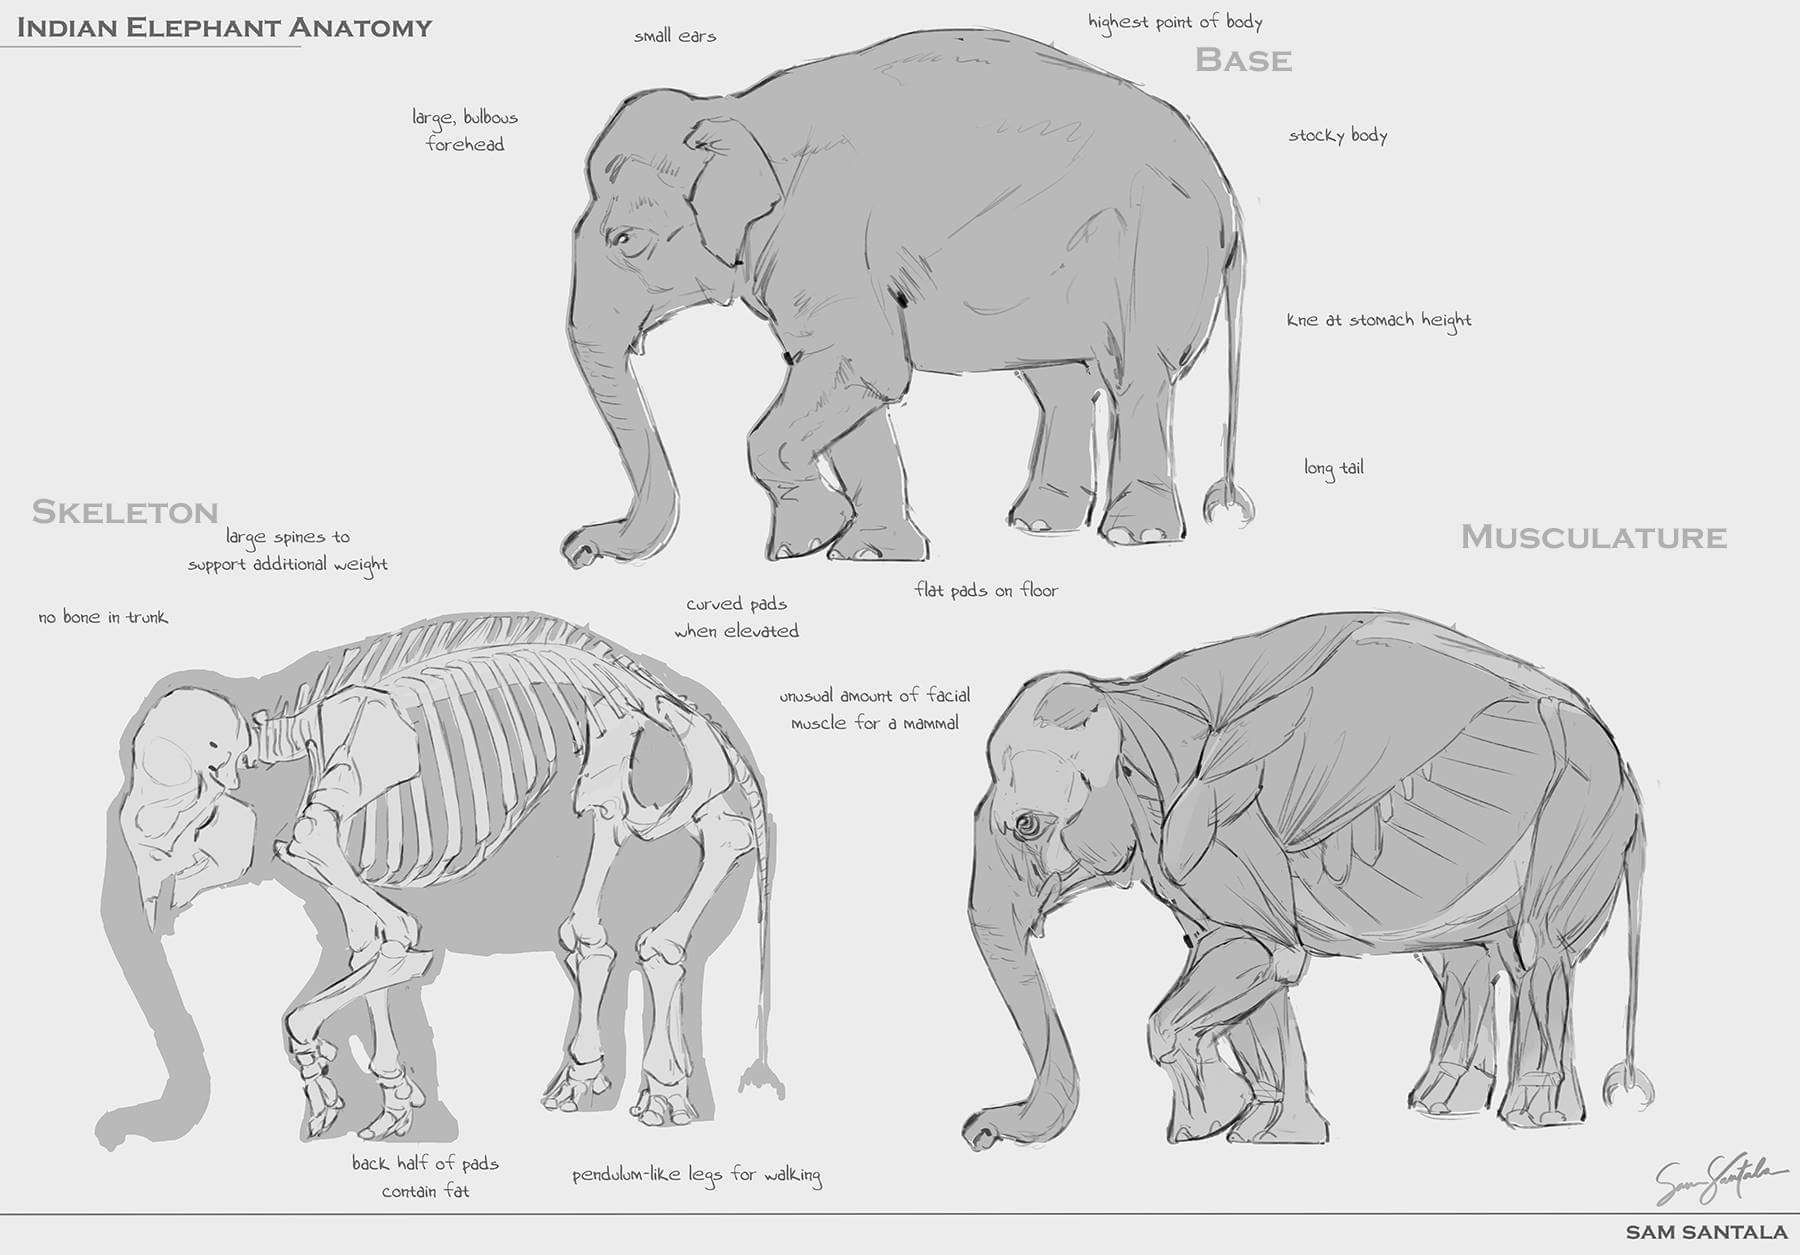 Pin de Arlete Martin en Elefante | Pinterest | Elefantes